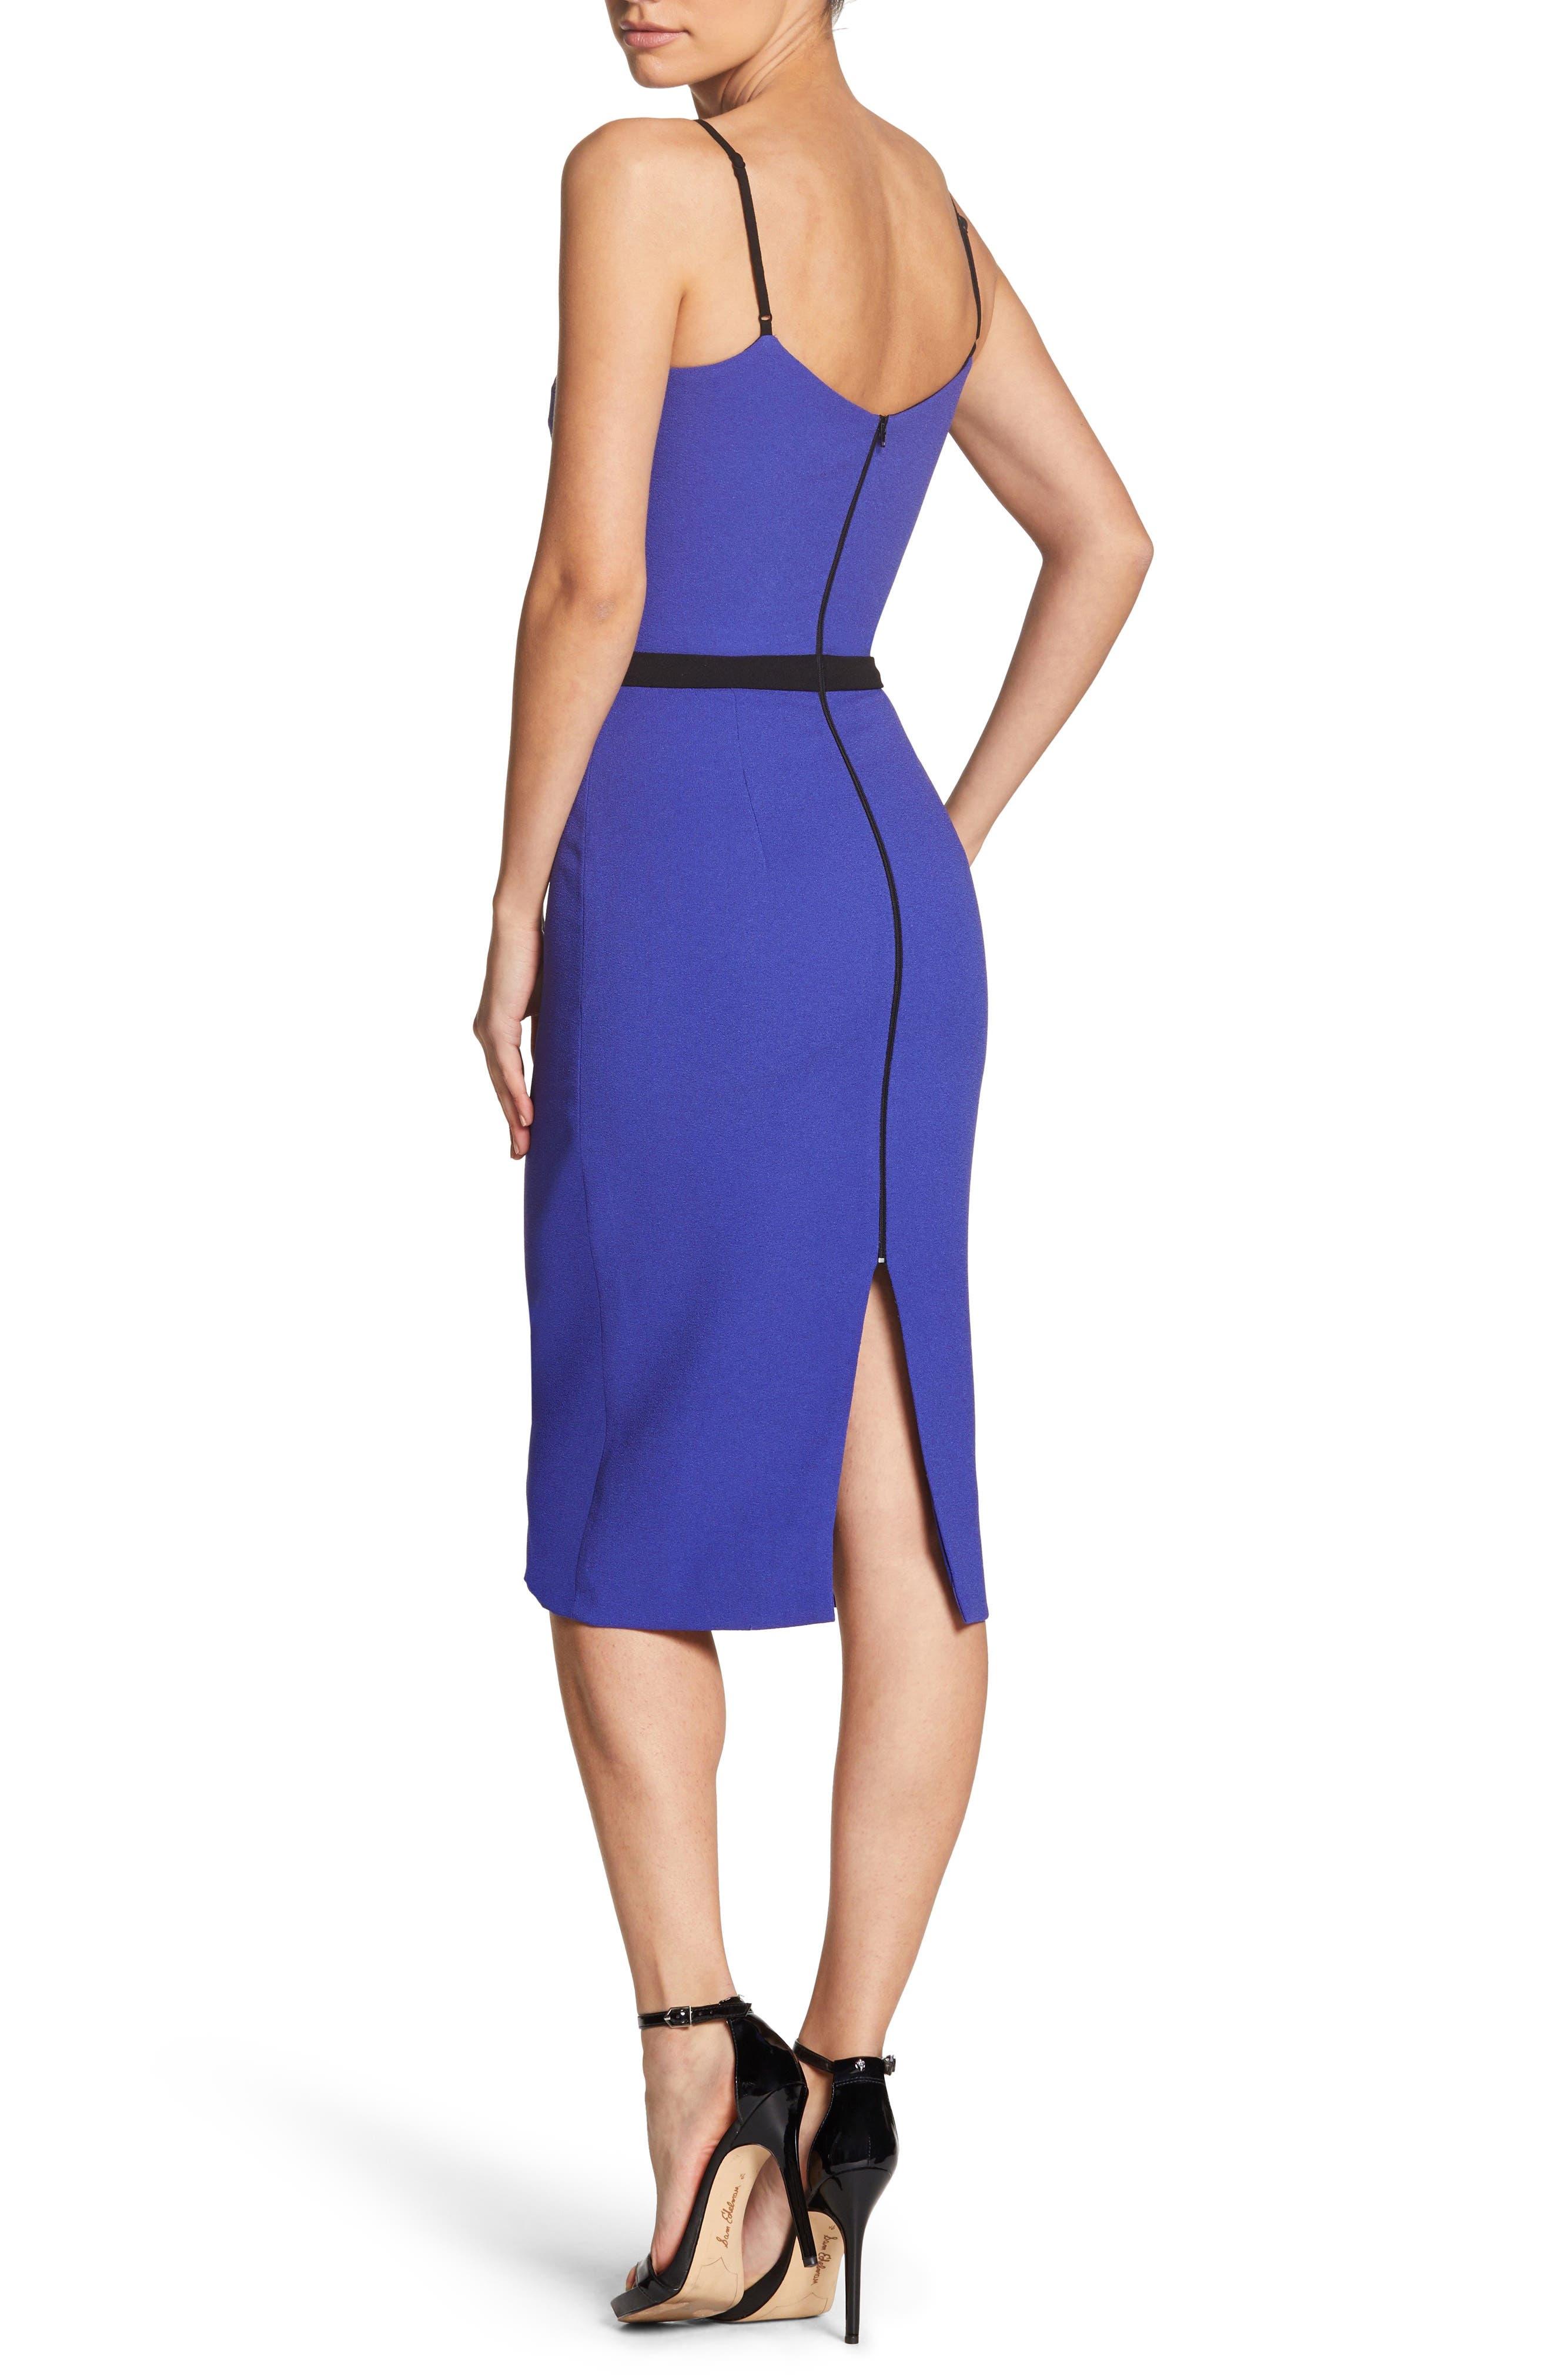 Emma Spaghetti Strap Body-Con Dress,                             Alternate thumbnail 2, color,                             BLUE/ VIOLET